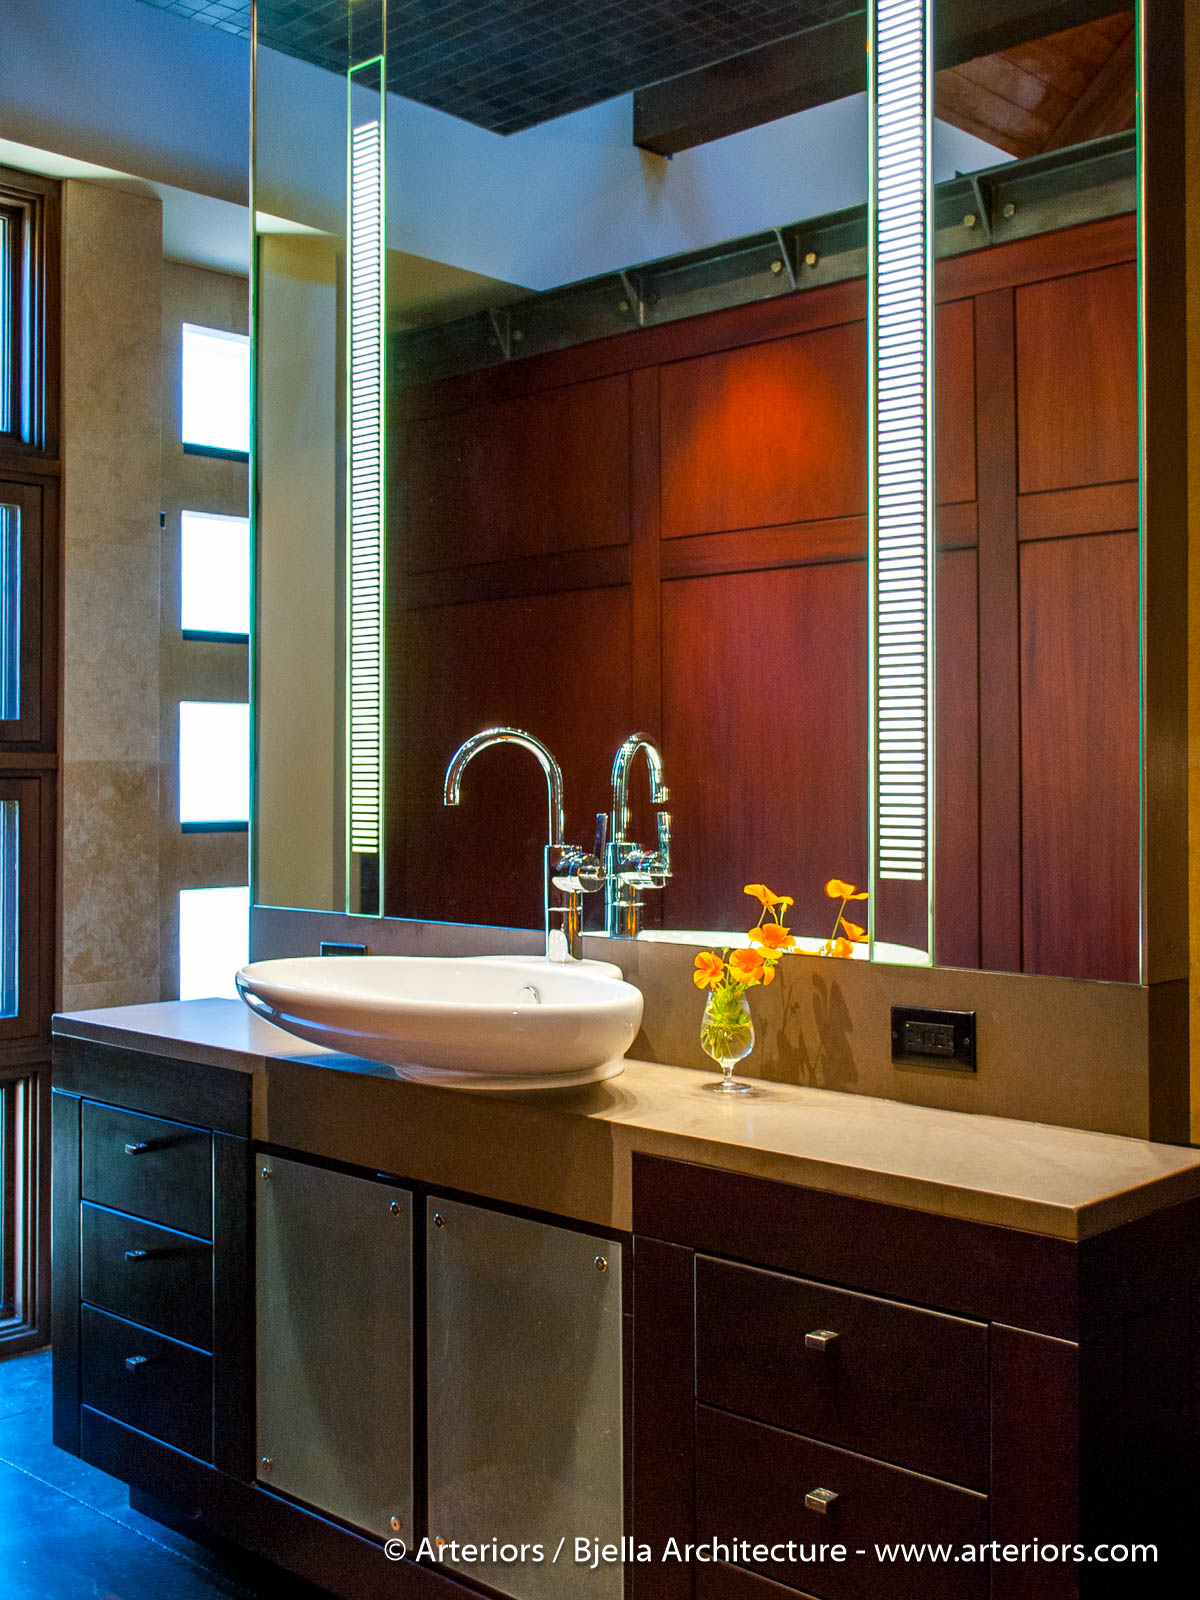 Modern Bathroom Vanity by Arteriors Architects